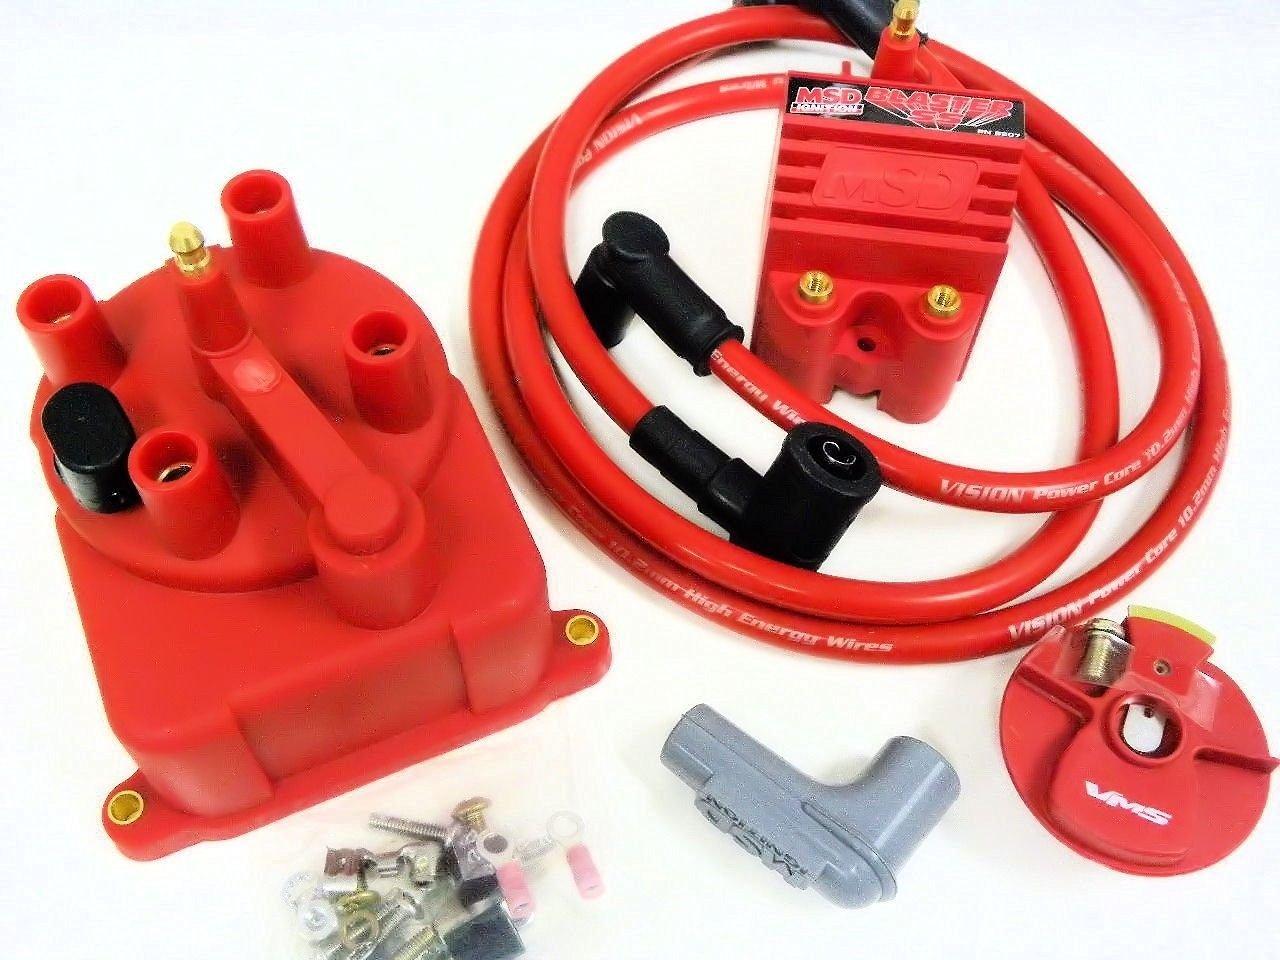 Buy 92 95 Honda Civic External Coil Distributor Cap Conversion Kit Wiring Harness Msd Blaster Ss